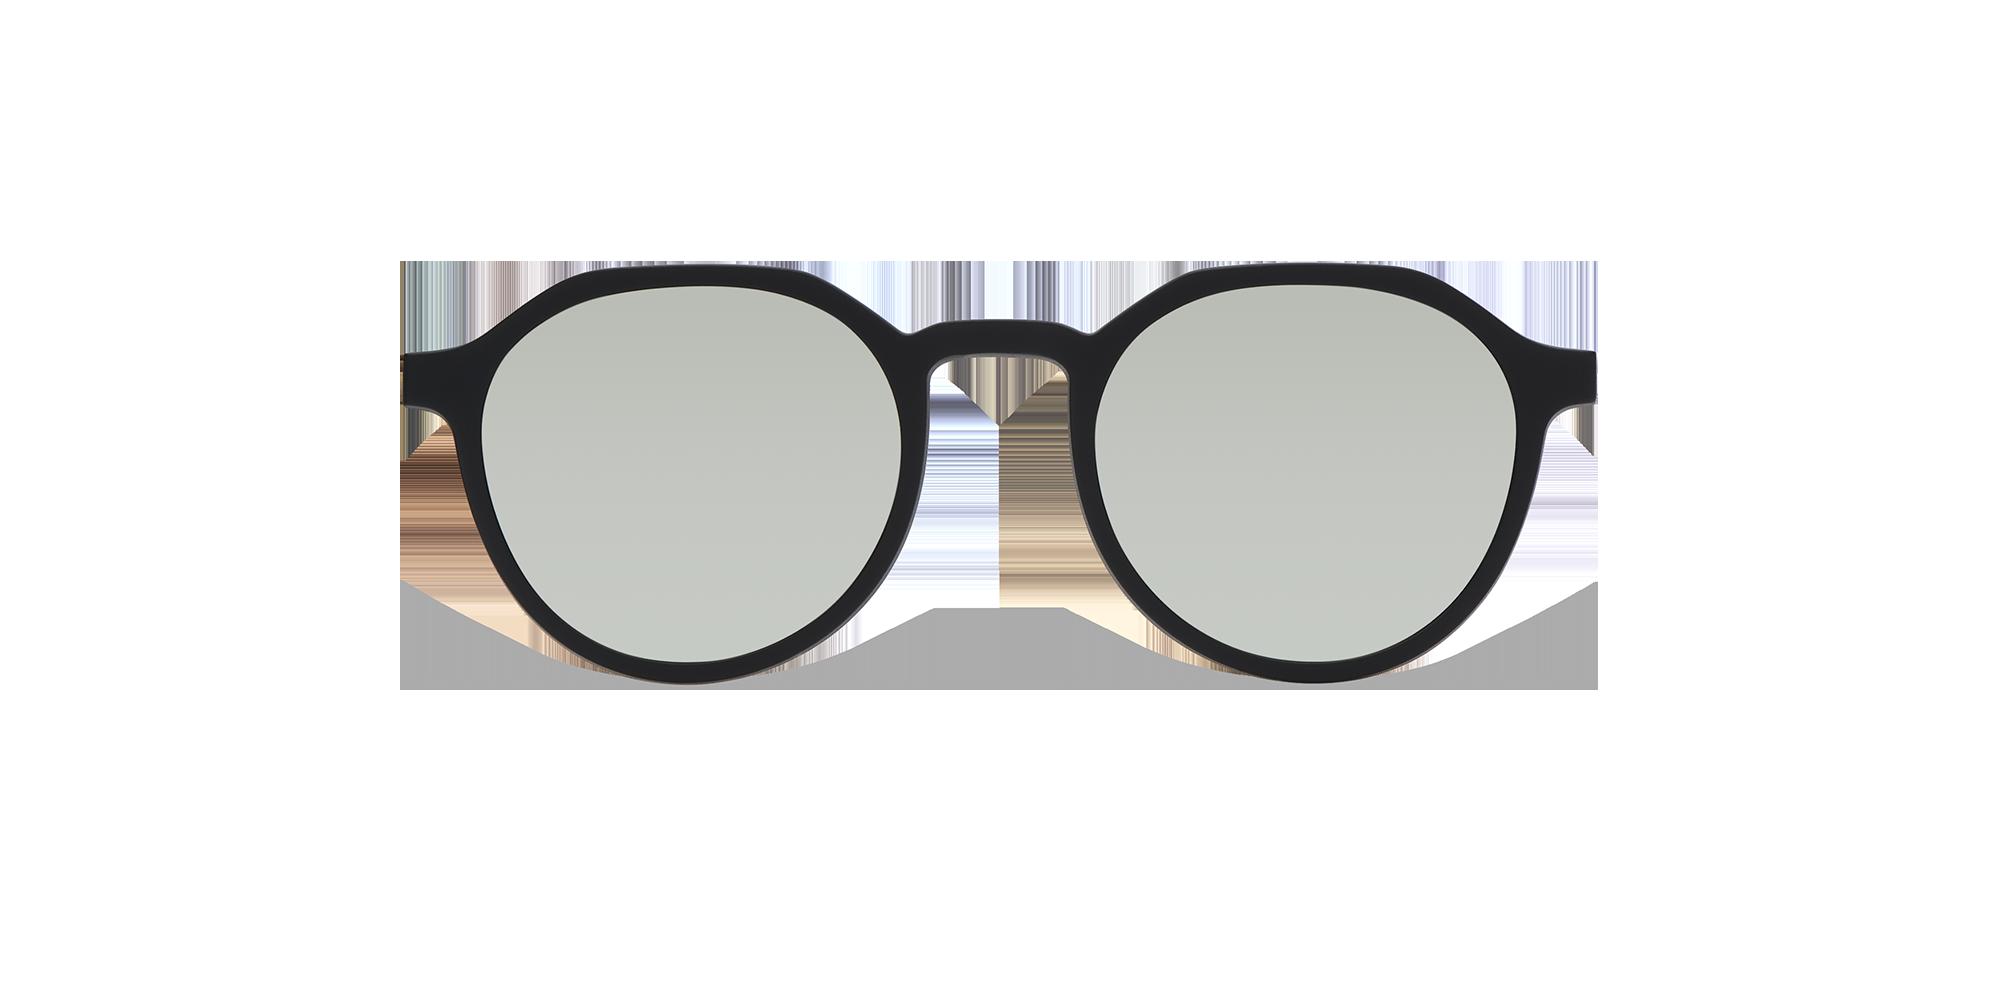 afflelou/france/products/smart_clip/clips_glasses/07630036429099_face.png